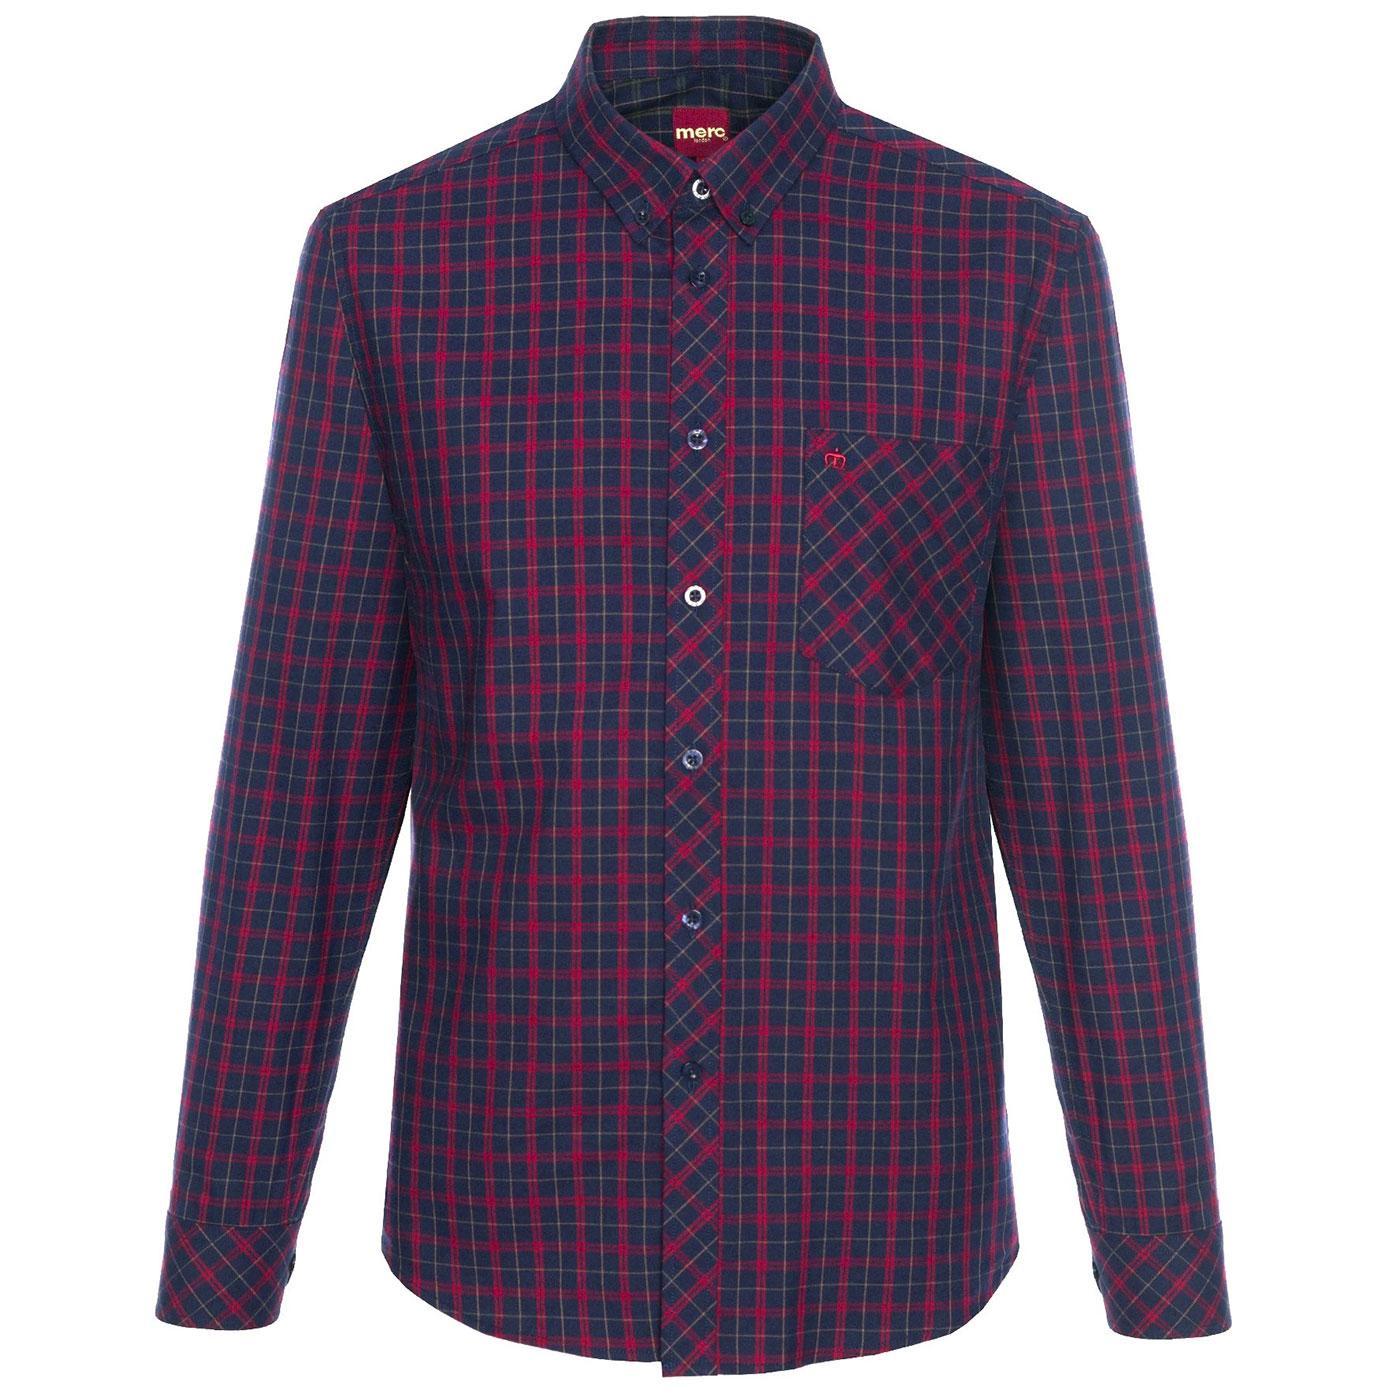 Keller MERC Men's Retro Mod Check Flannel Shirt